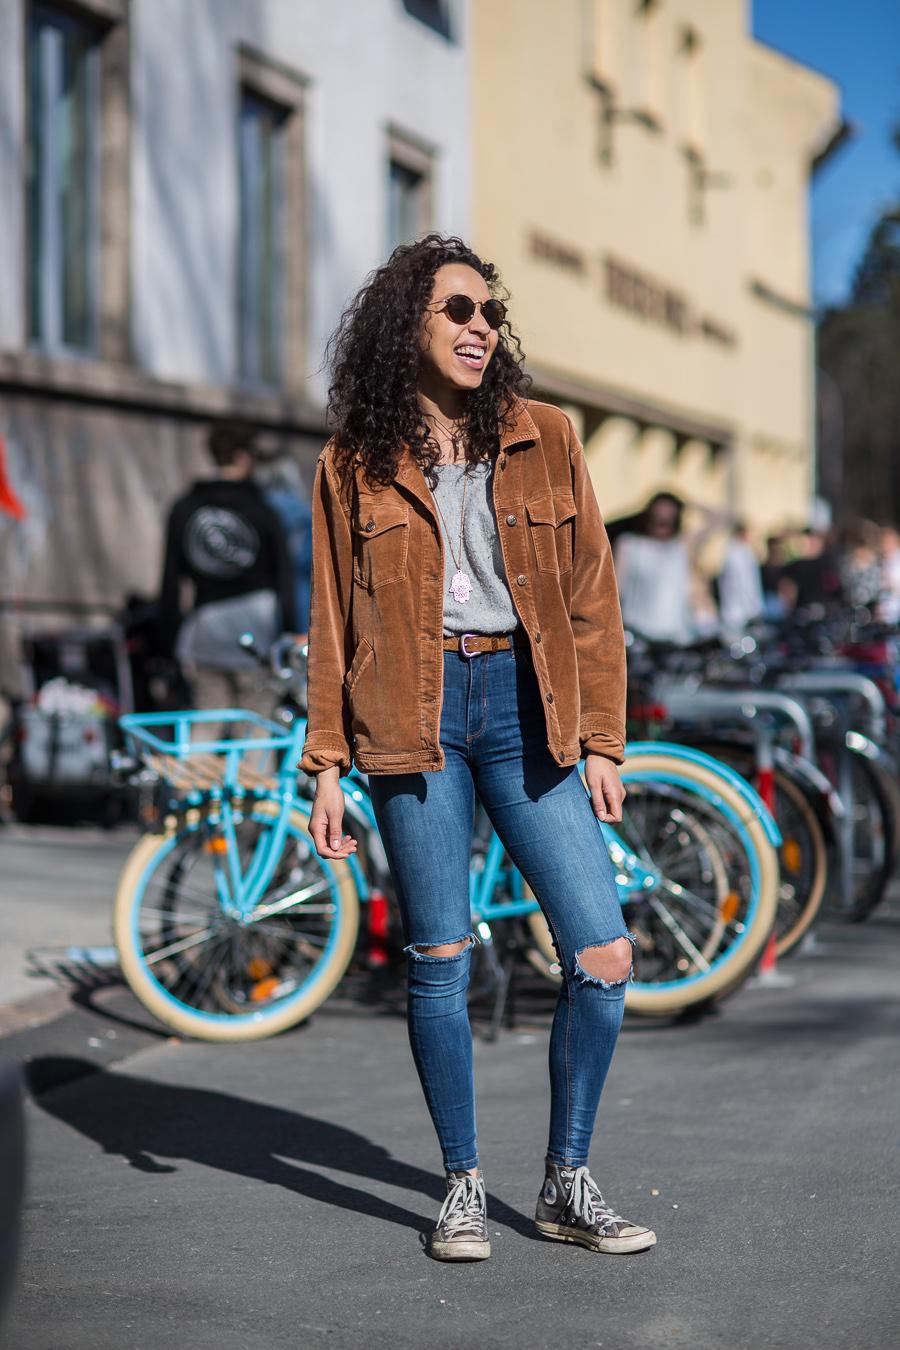 street-style-fashion-blog-innsbruck-vintage-markt-6.jpg